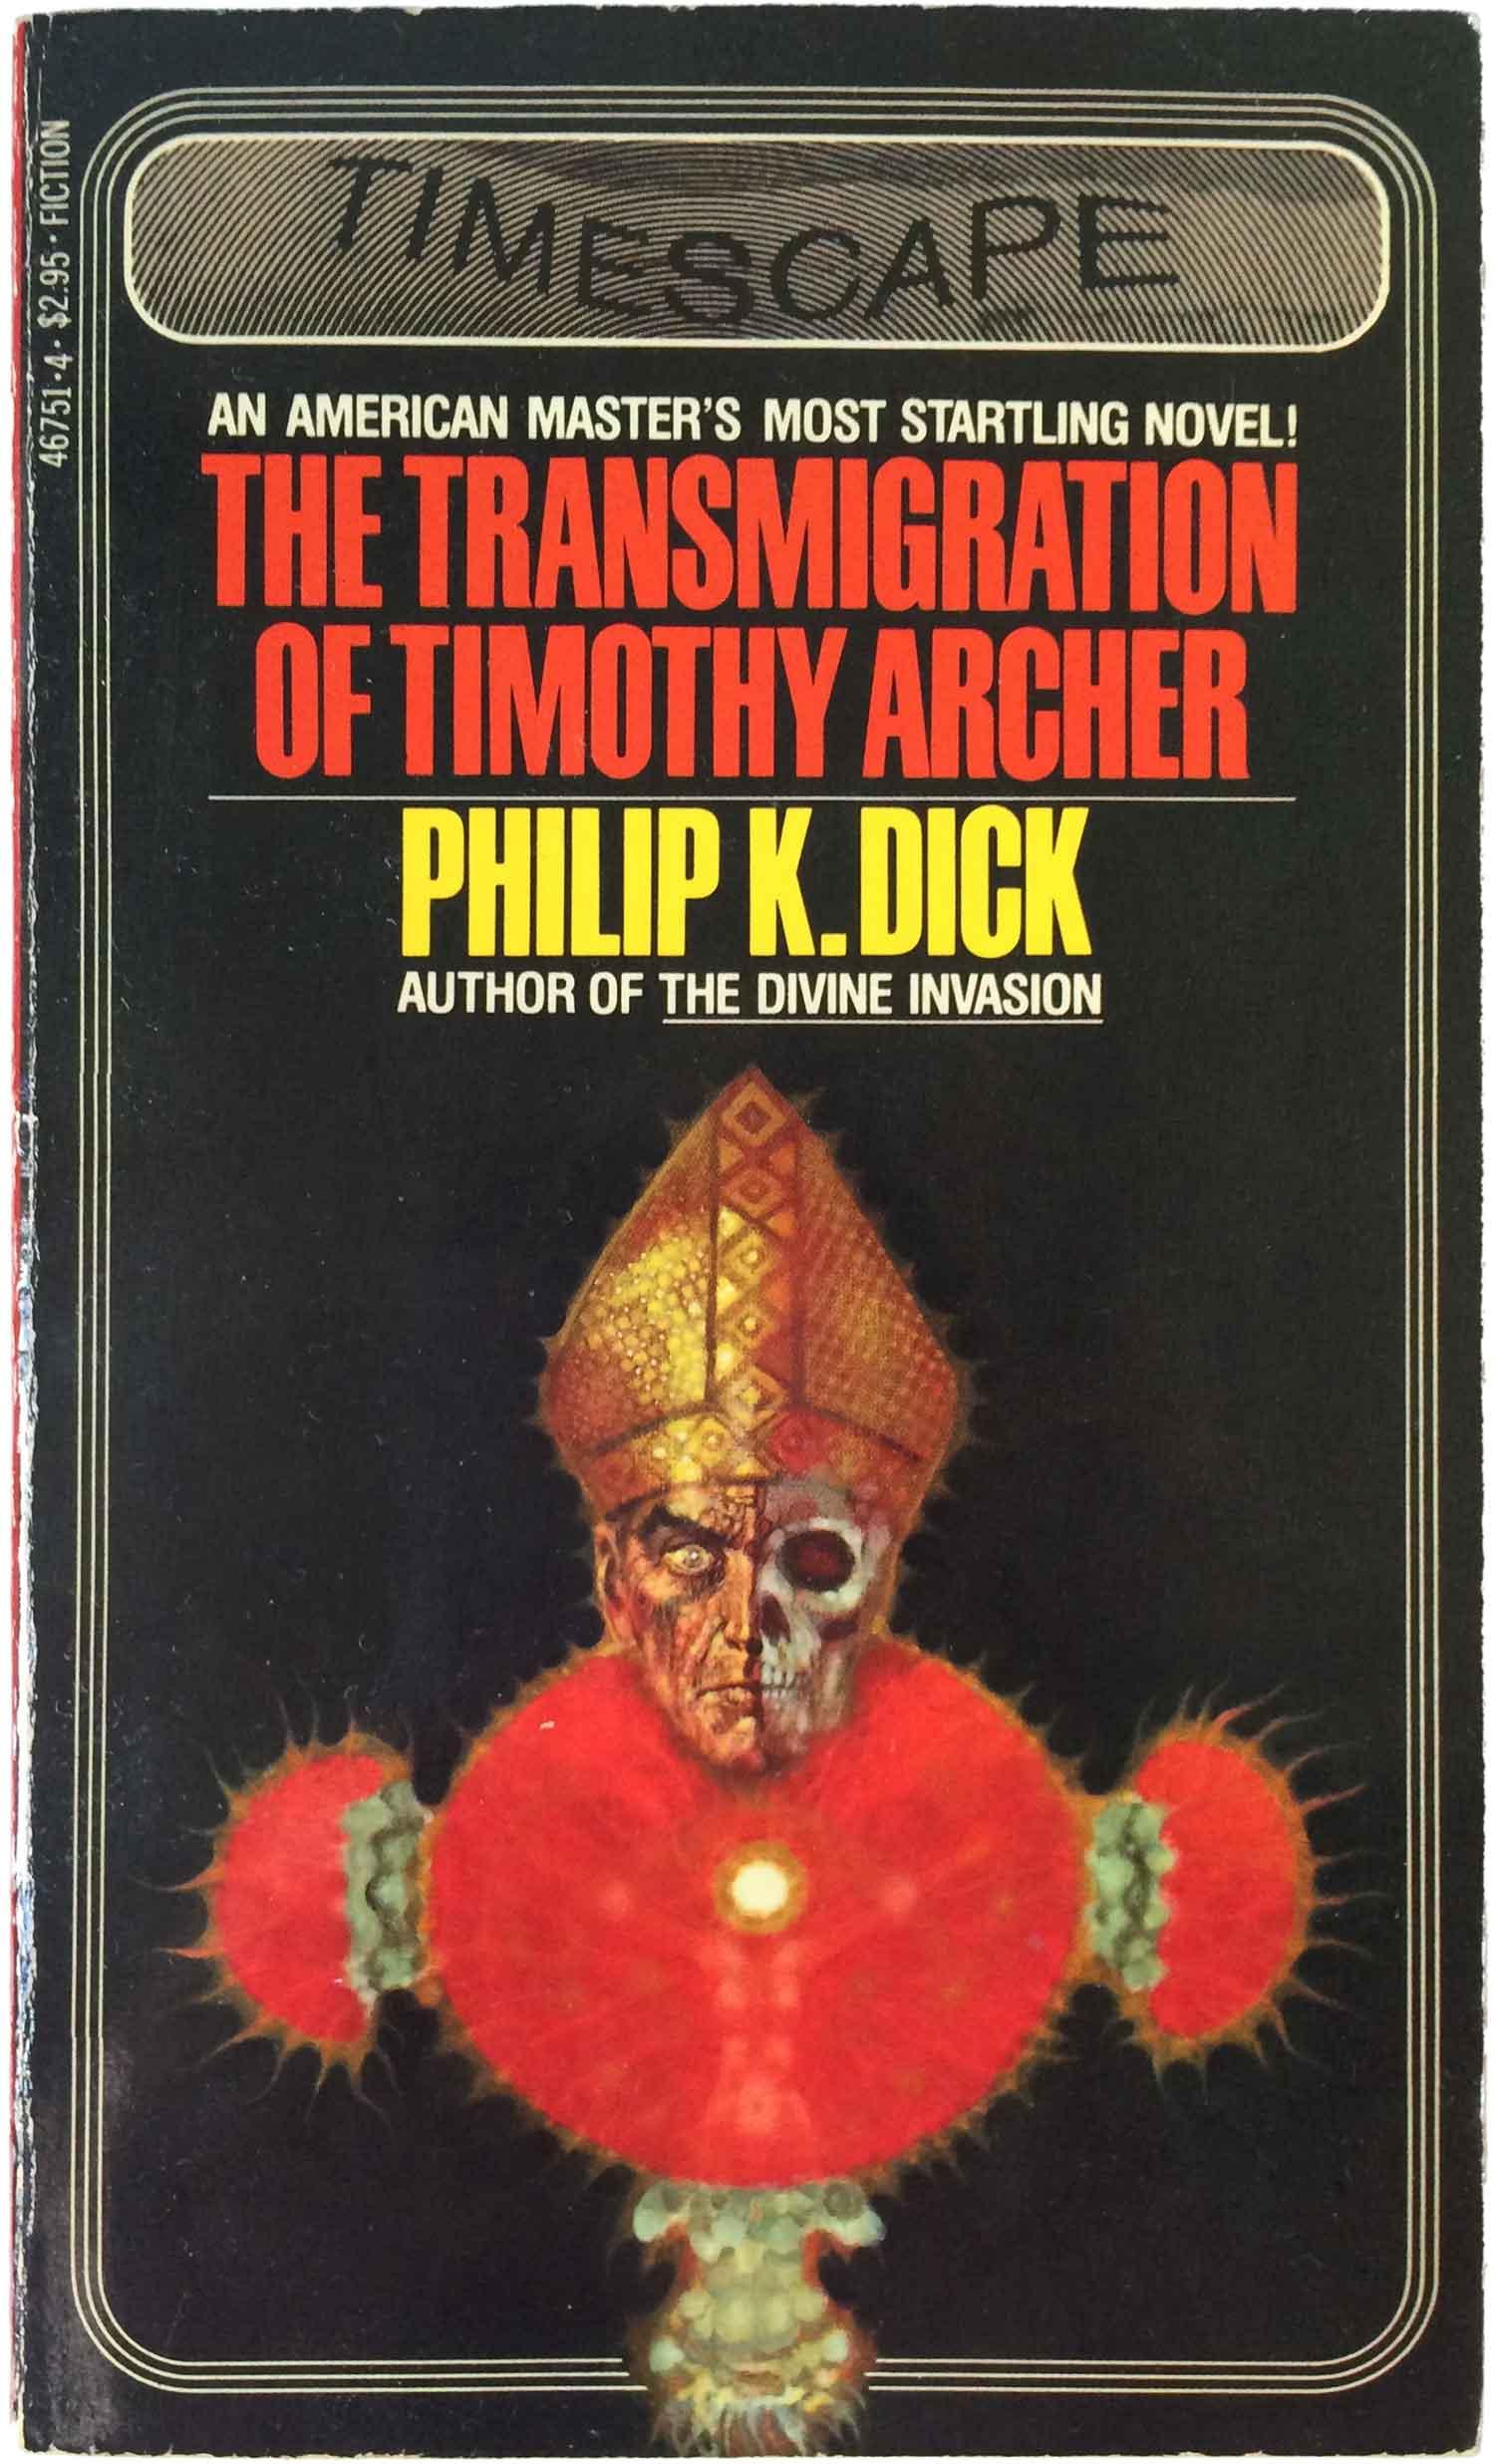 pkd_transmigration_timescape